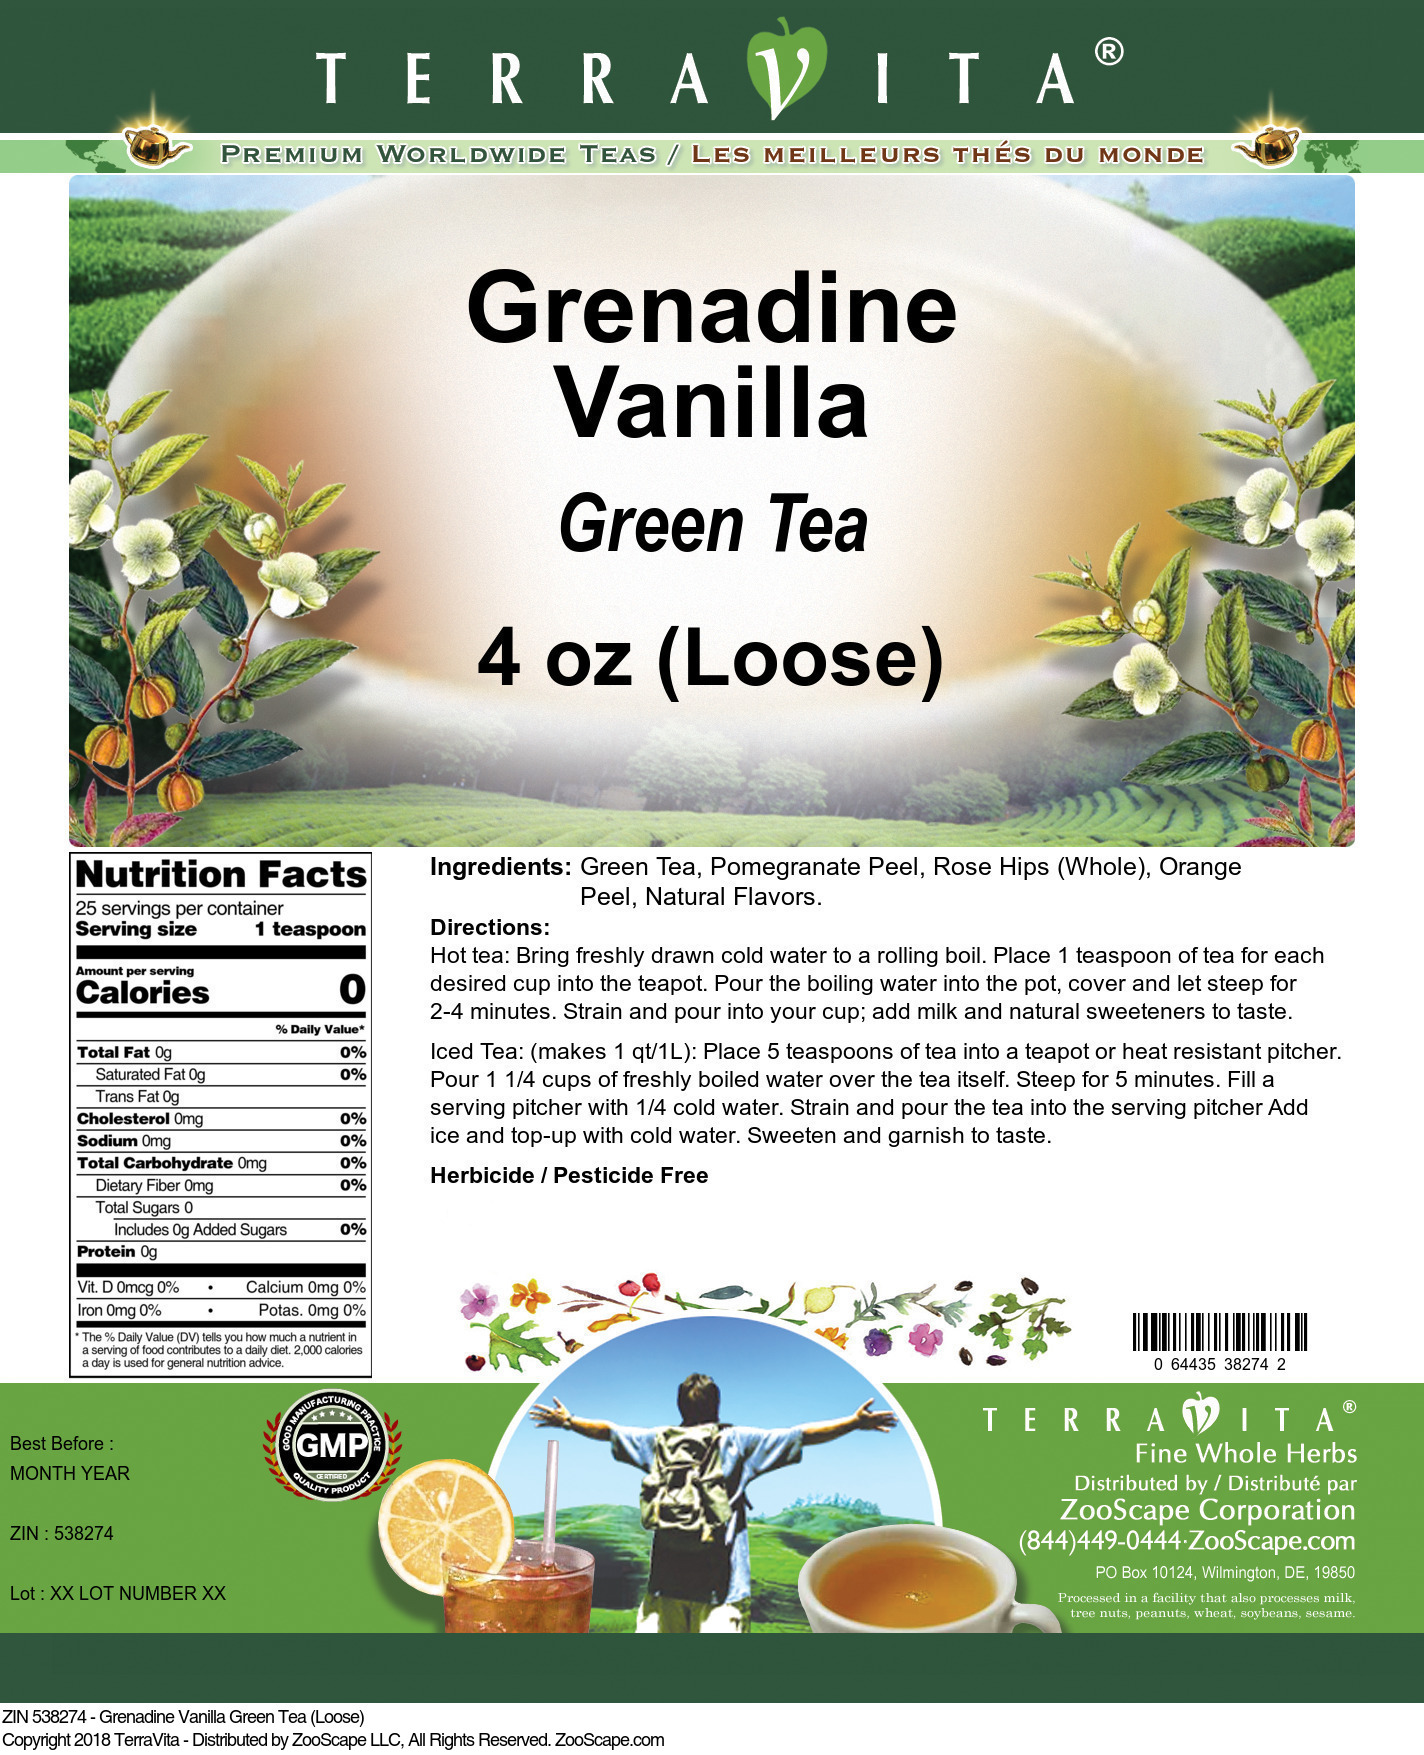 Grenadine Vanilla Green Tea (Loose)